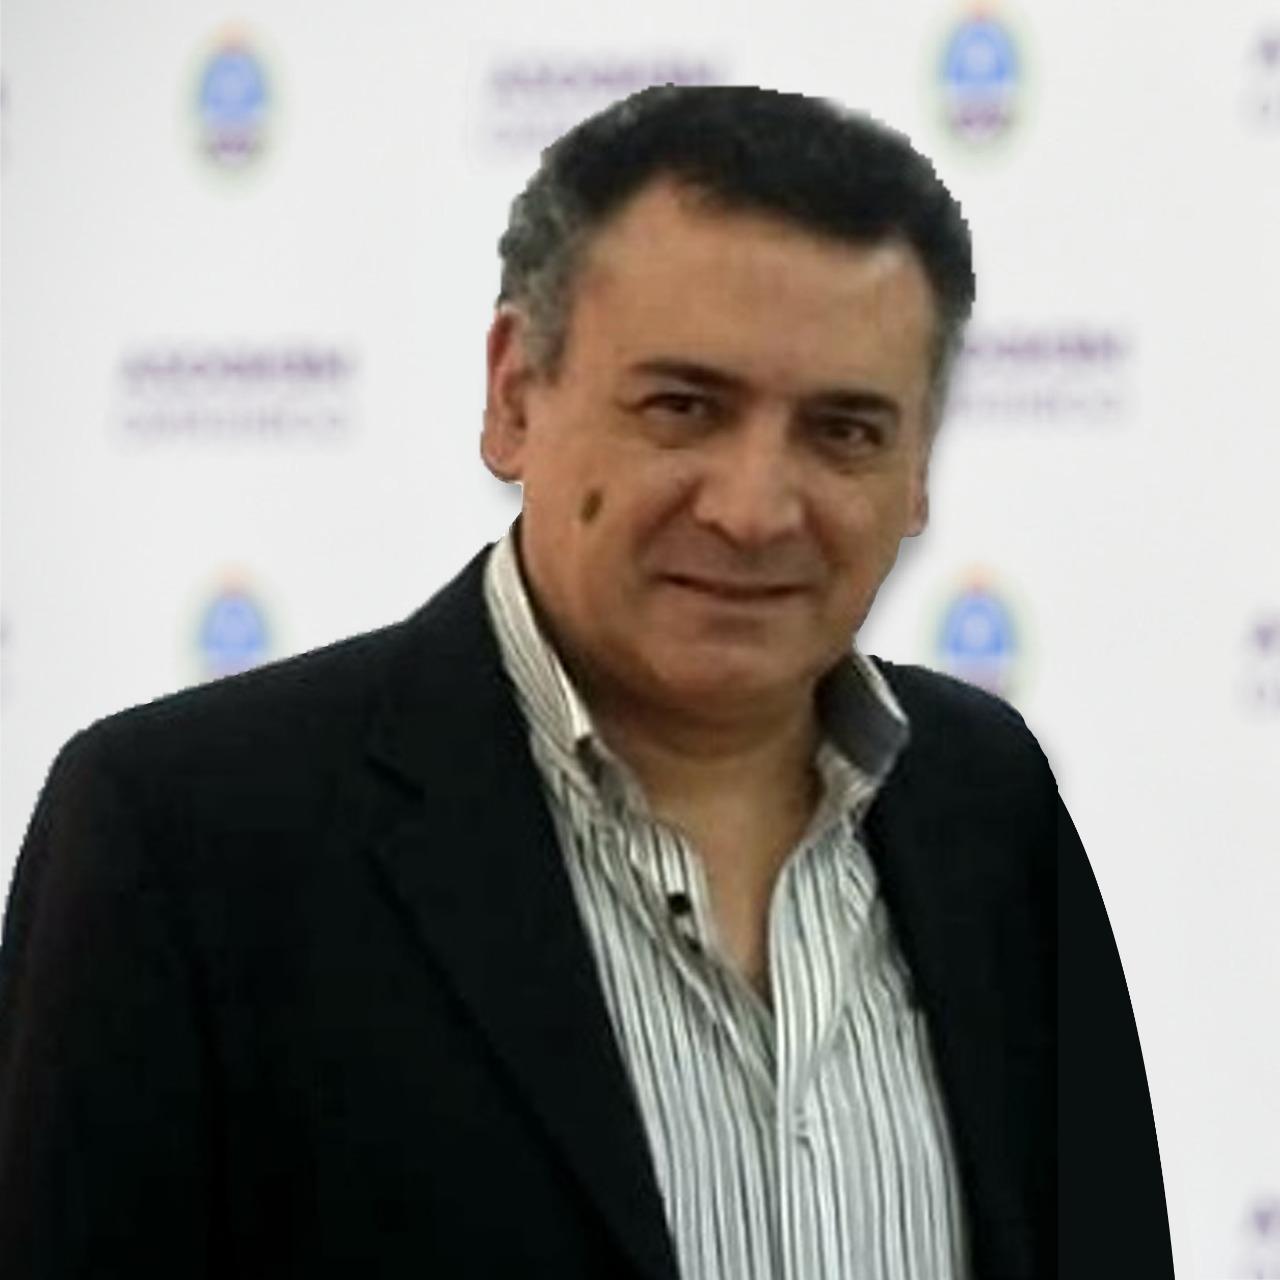 Ricardo Daniel Guiraldes